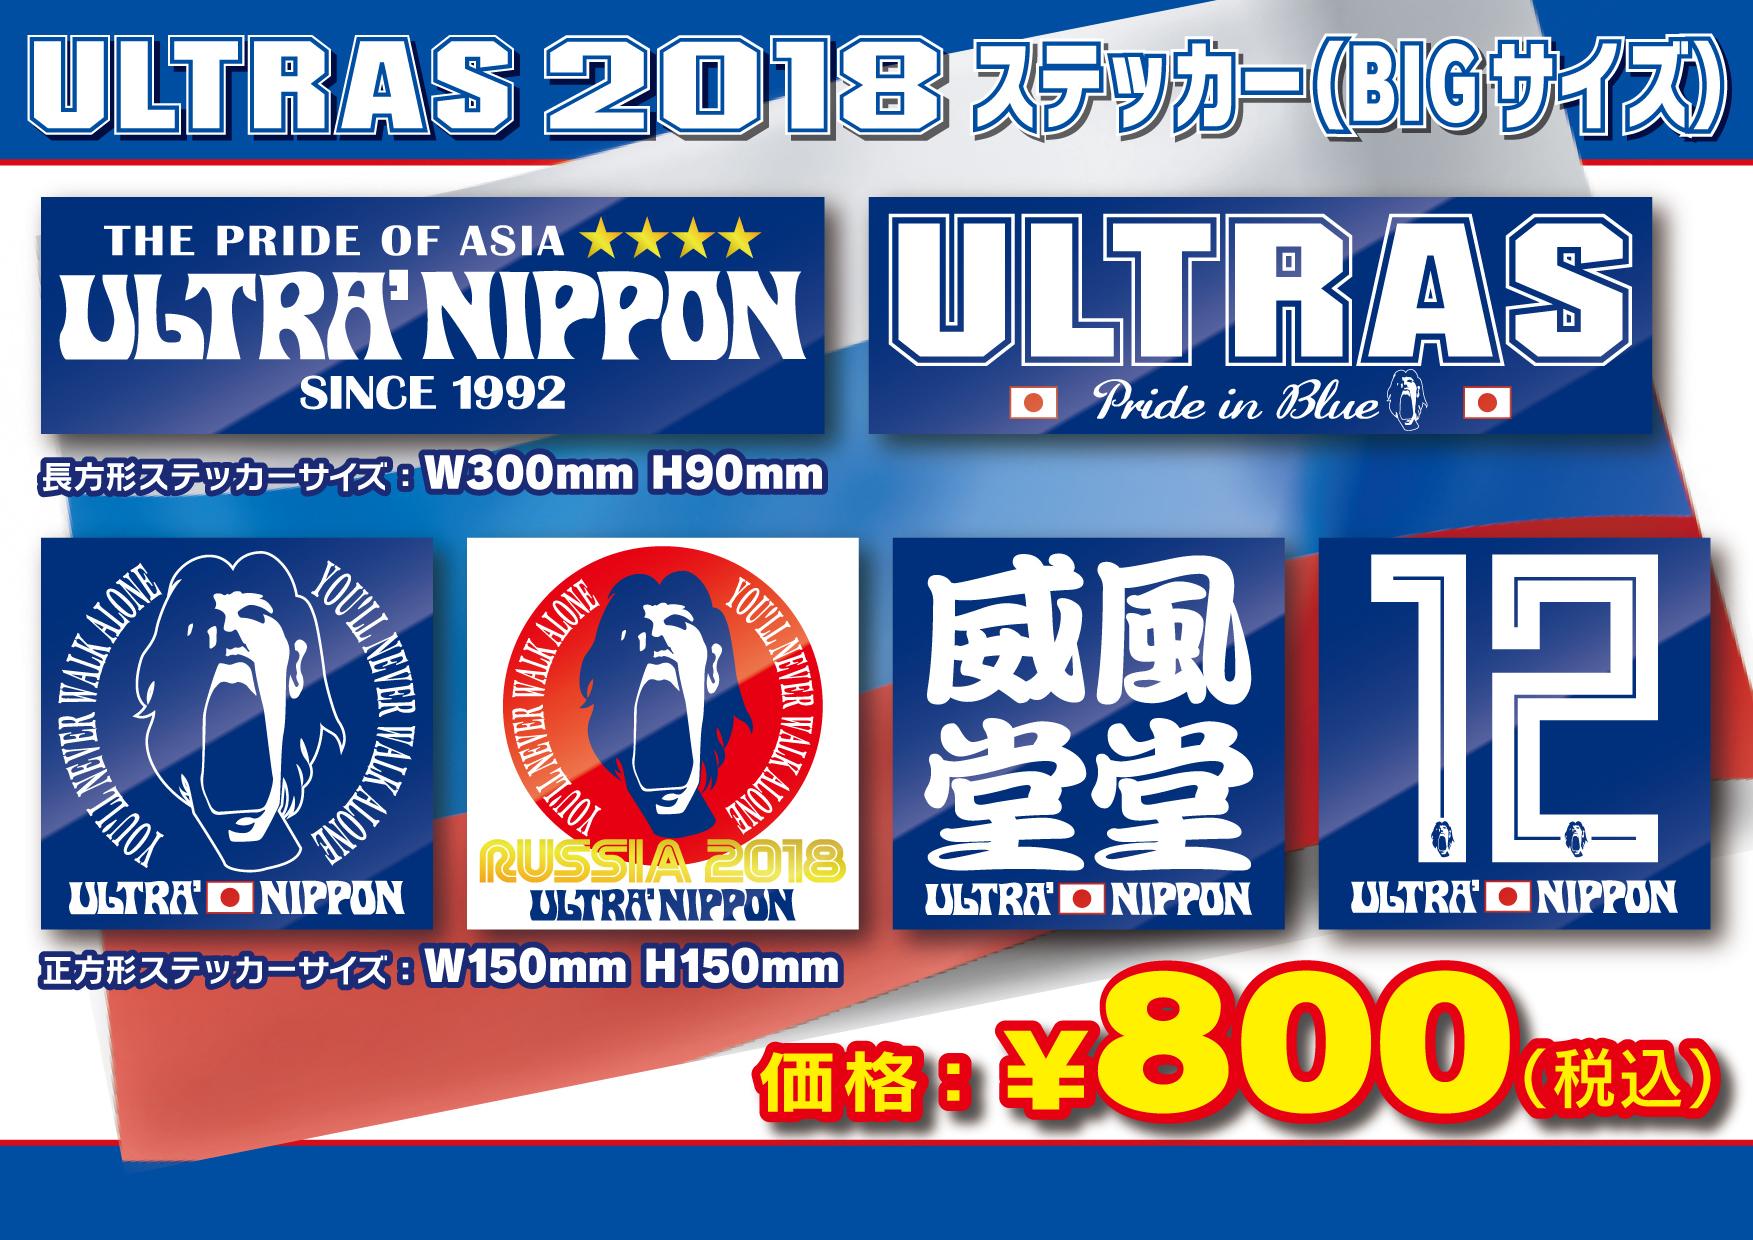 【SALE50%OFF】ULTRAS2018 ステッカー(BIGサイズ)【メール便発送可】